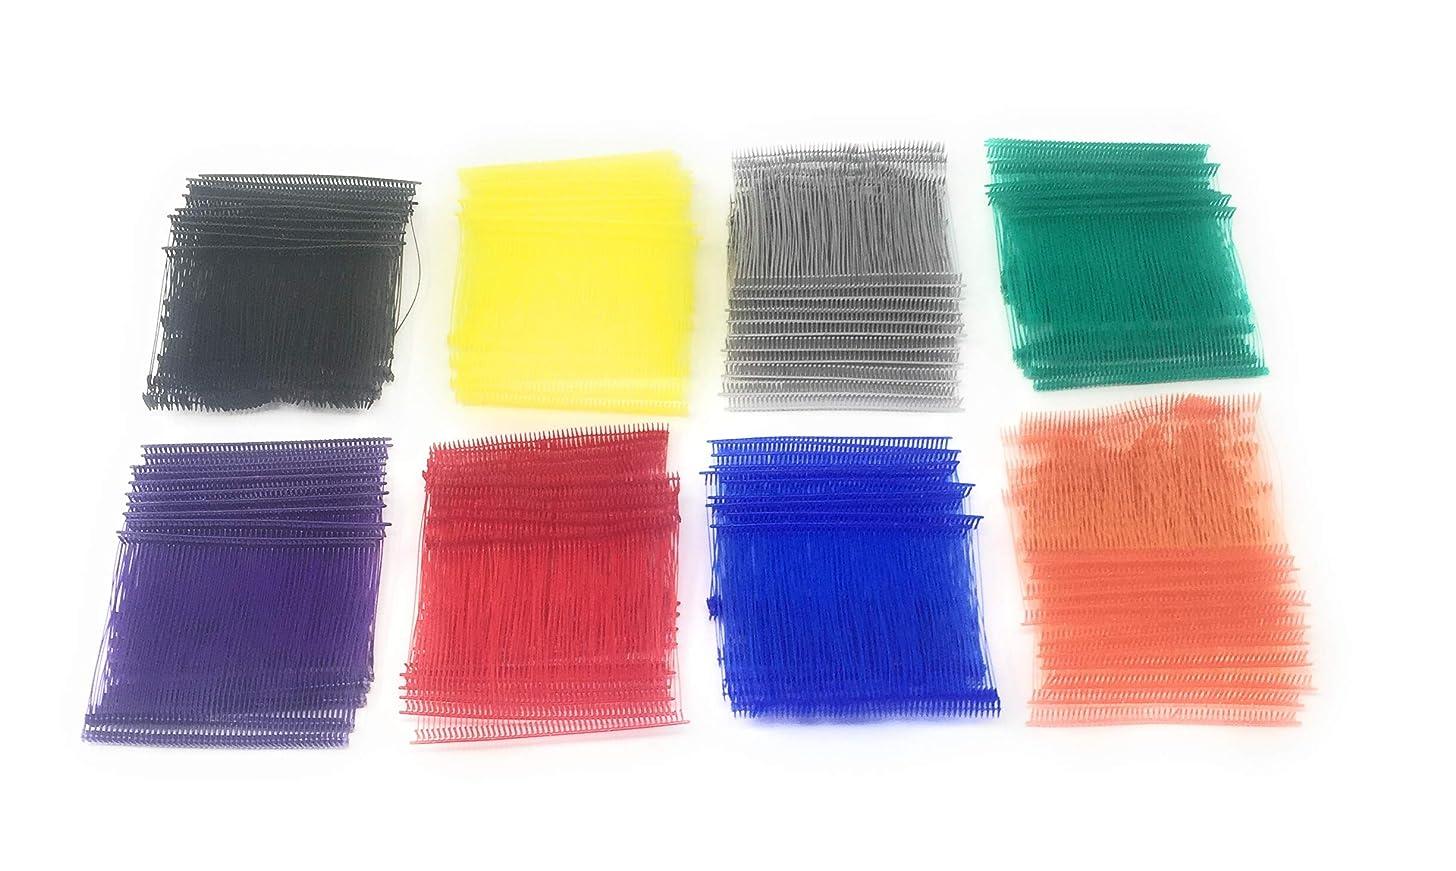 Standard Tagging Gun Barbs Fasteners 3 Inch 500 each of Black Red Blue Green Orange Purple Grey Yellow 4000 Total Barbs